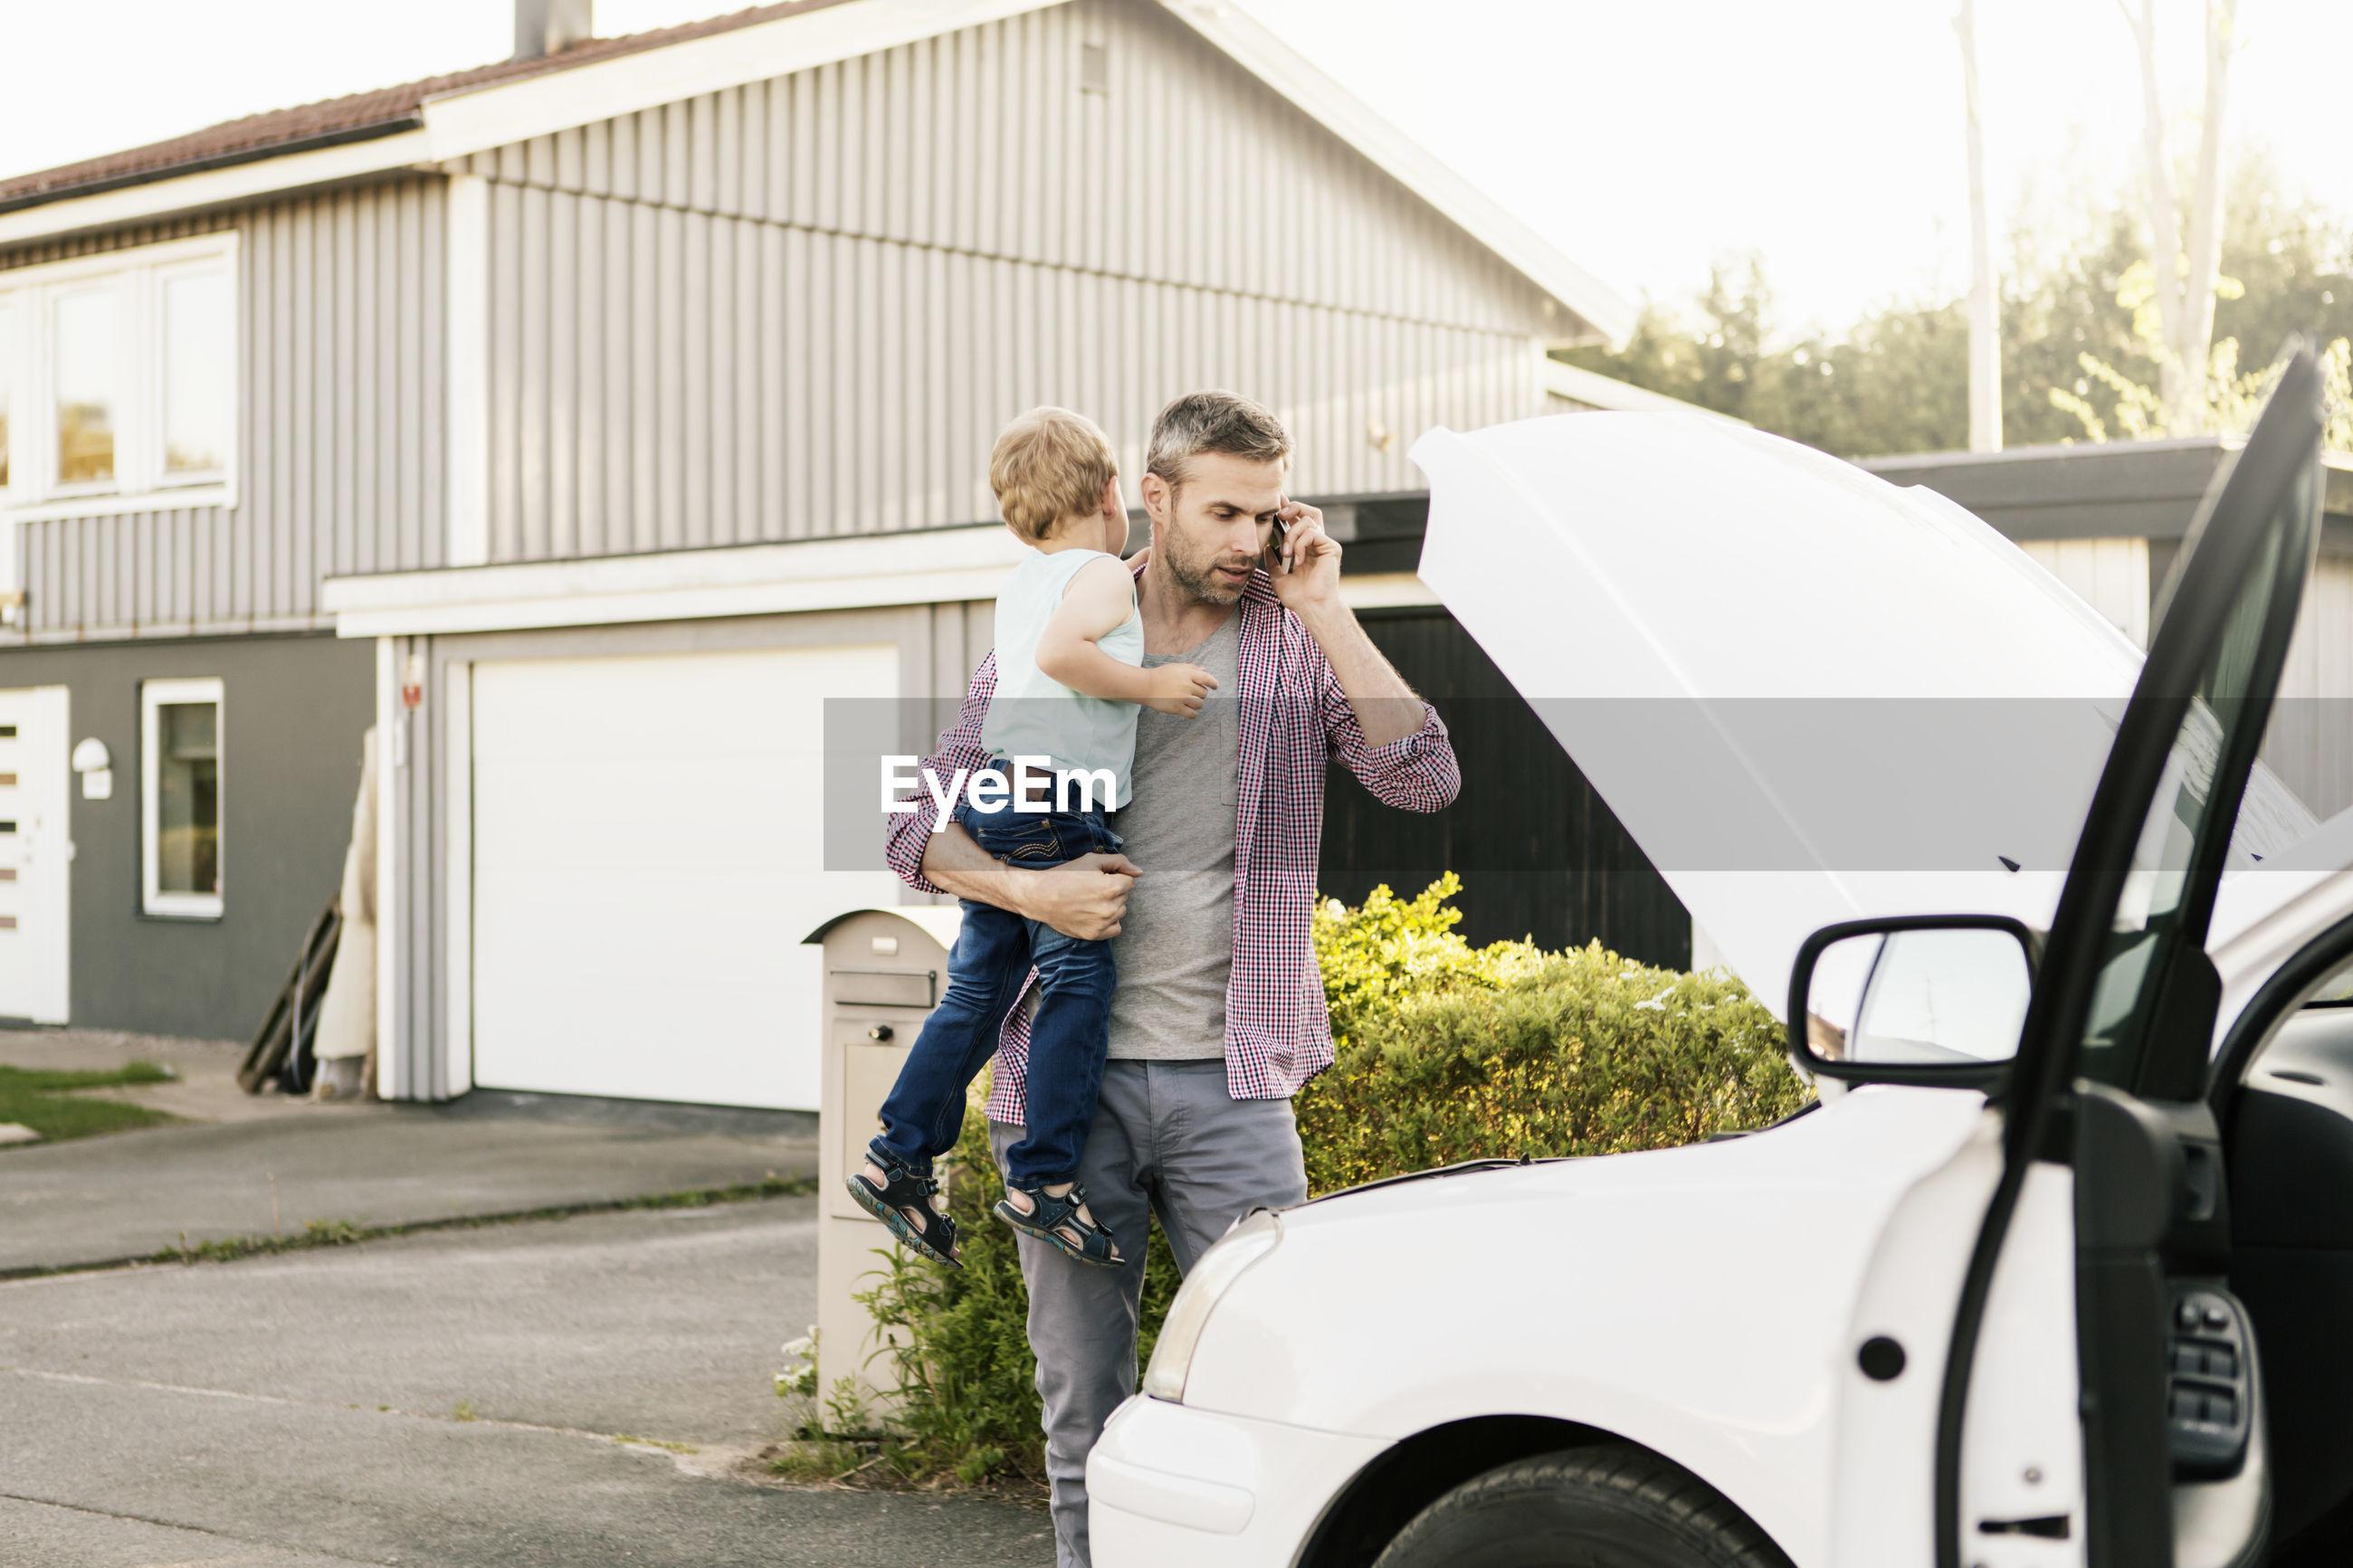 FULL LENGTH OF BOY STANDING BY CAR